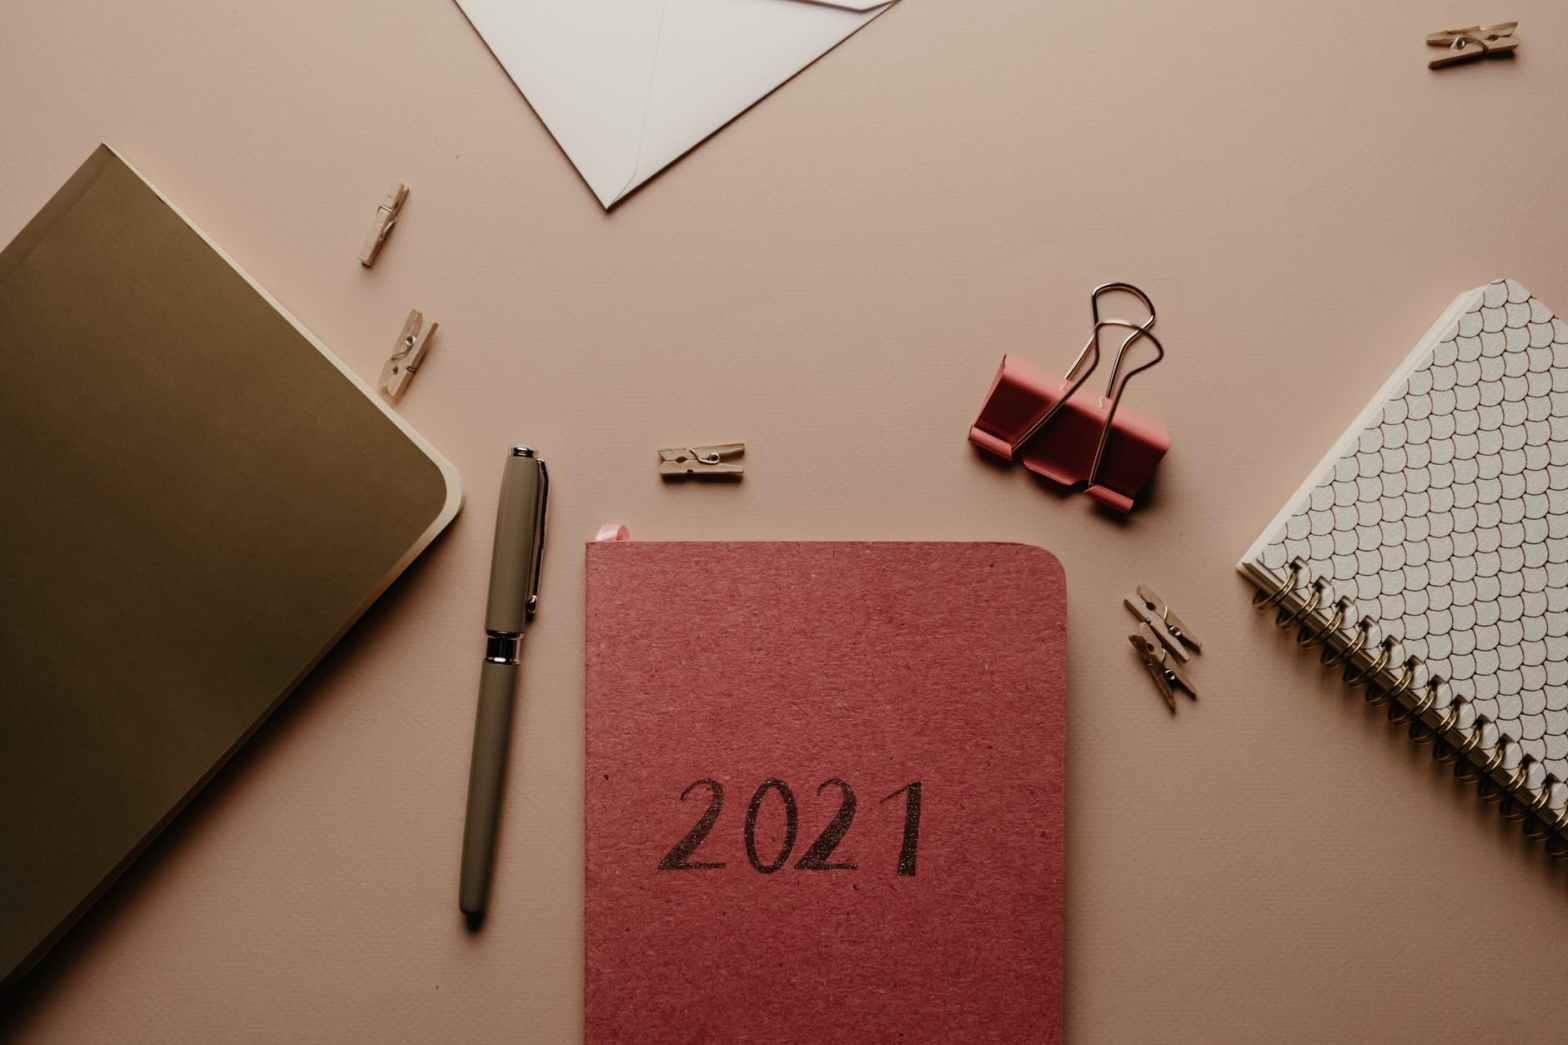 agenda 2021 et fournitures de bureau